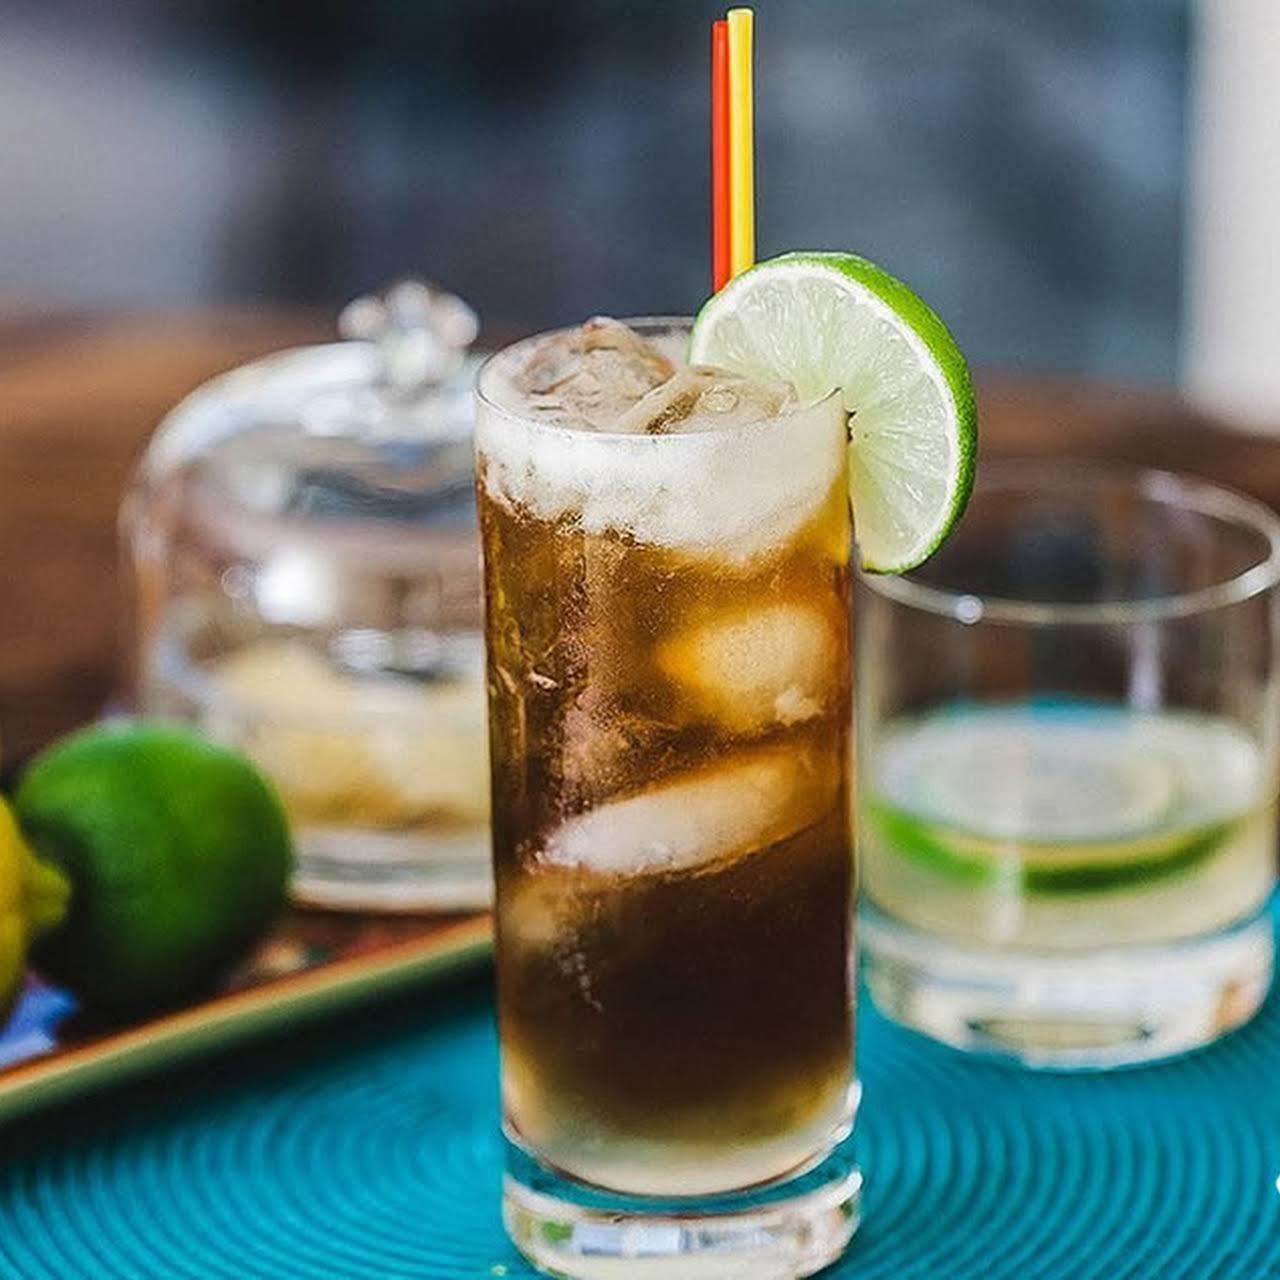 10 Best Vodka Gin Rum Triple Sec Recipes | Yummly